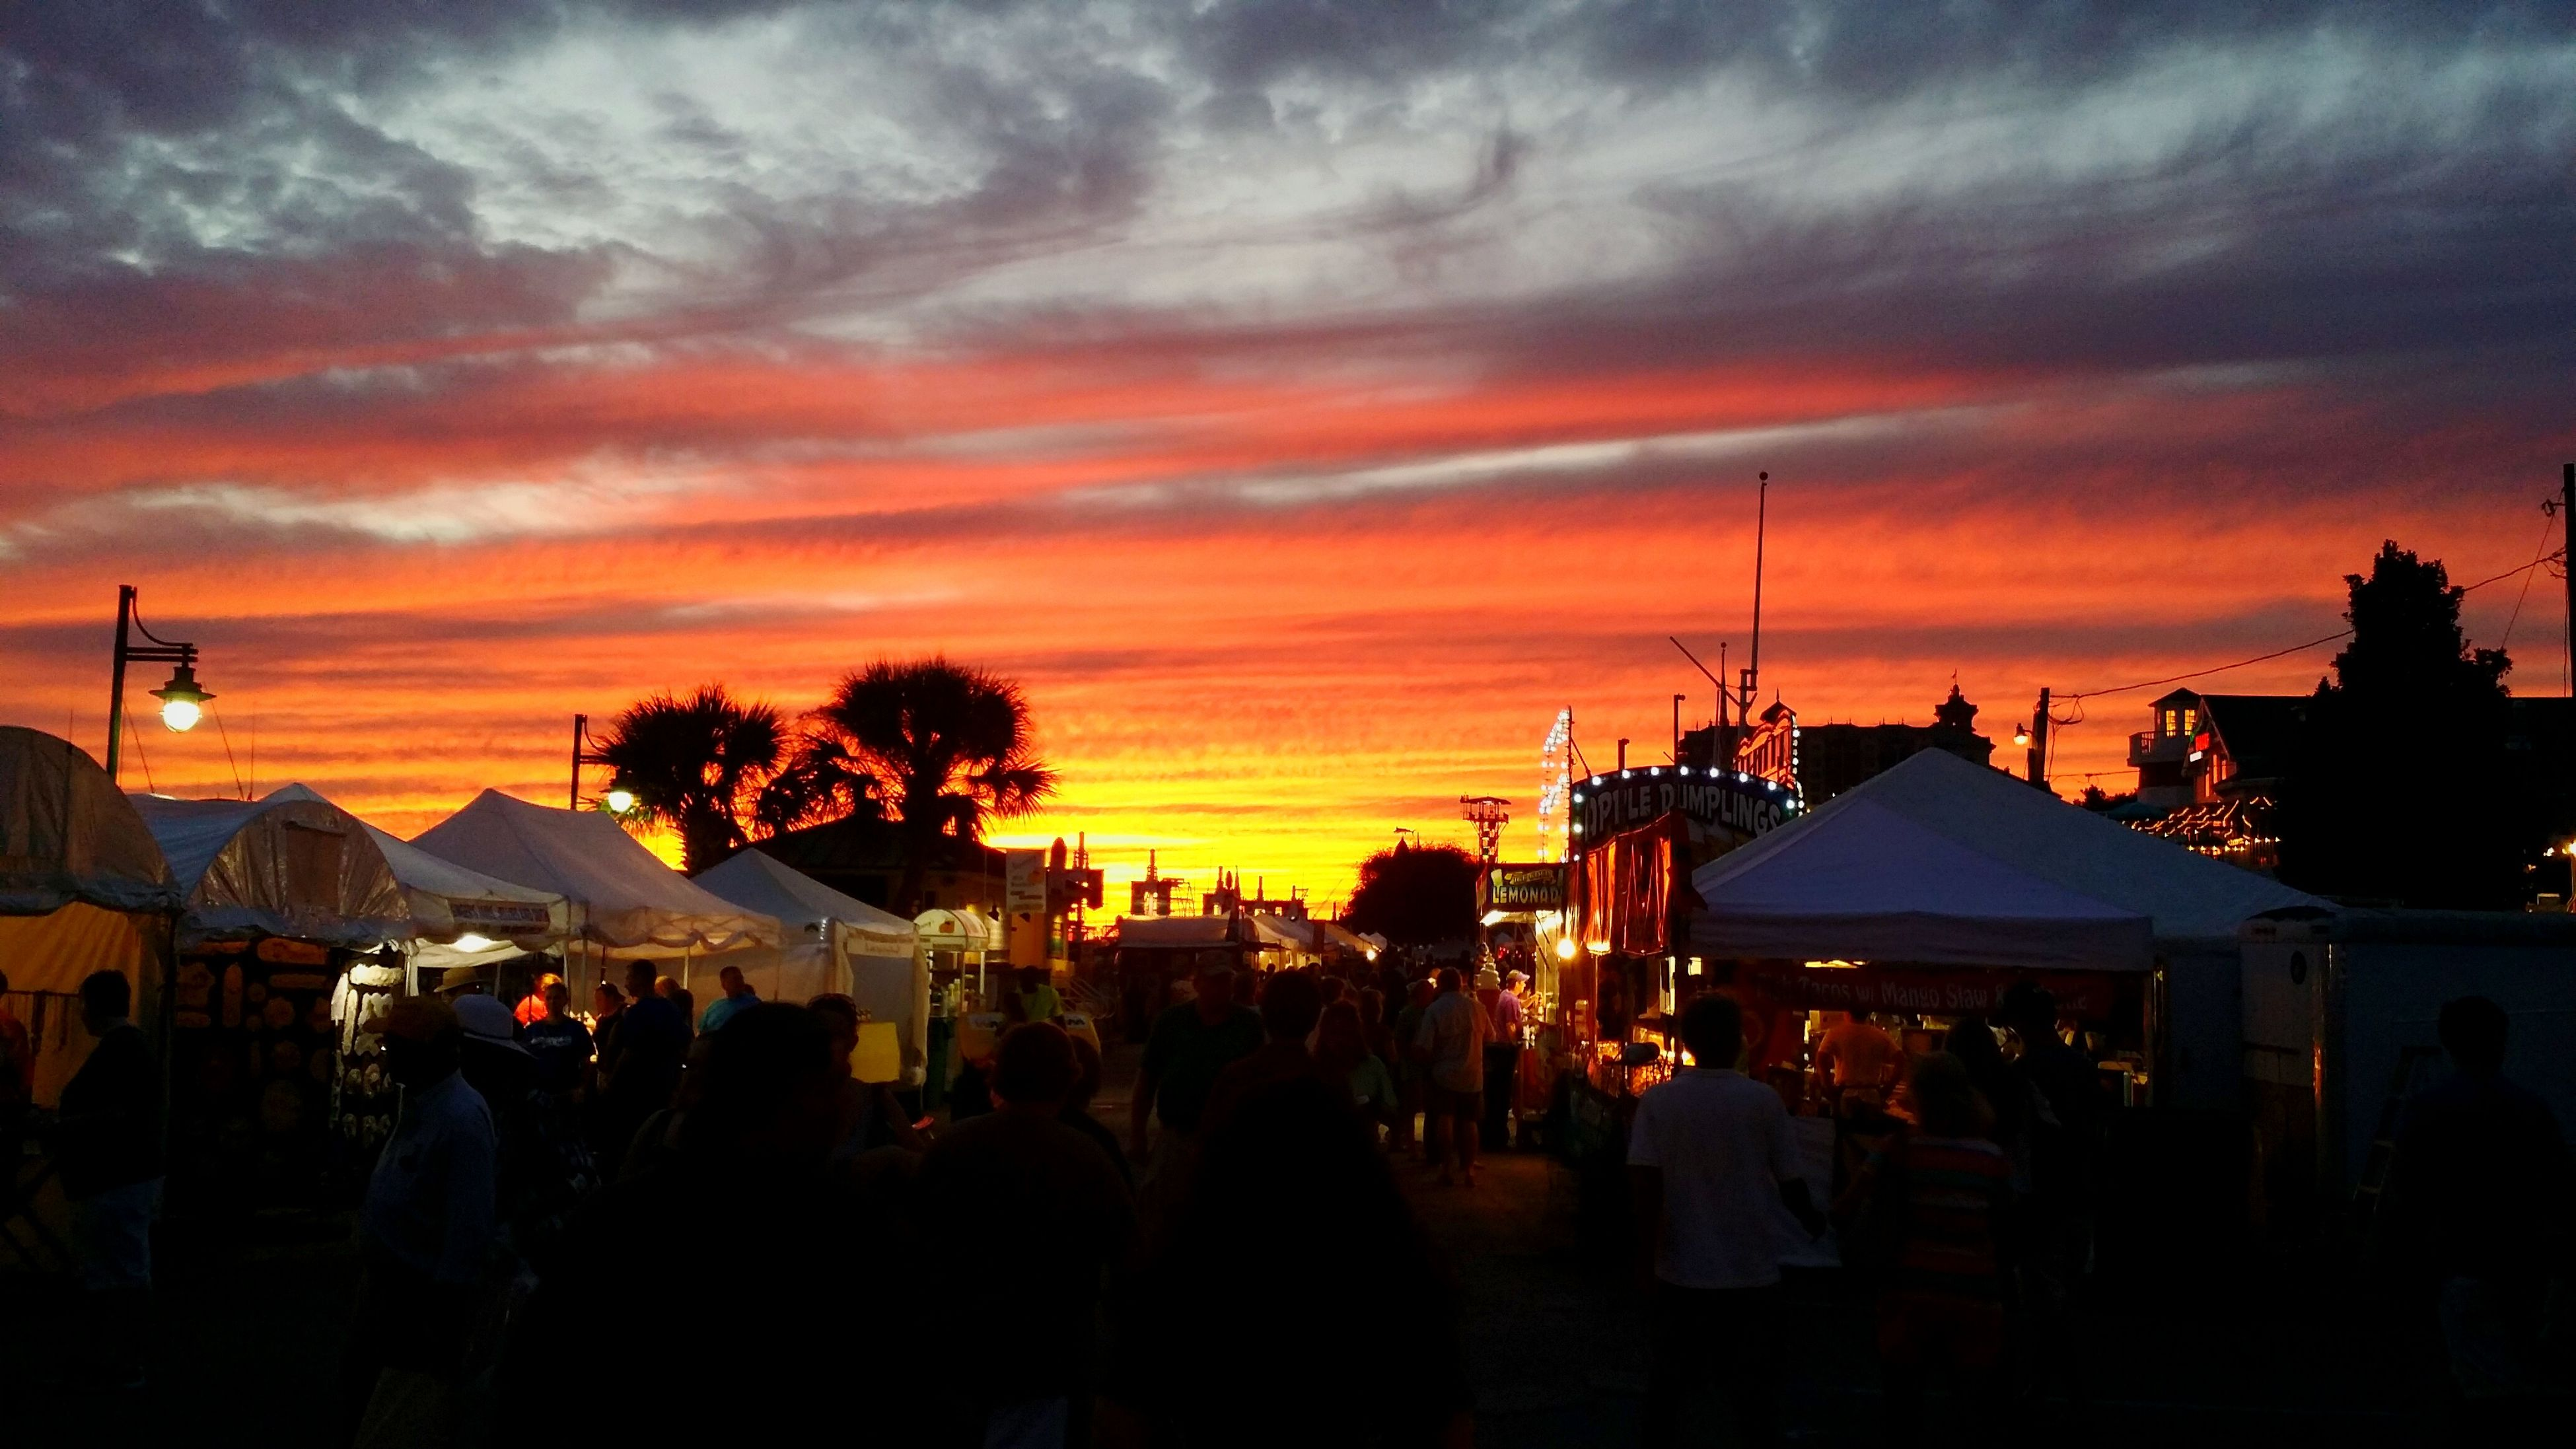 sunset, sky, large group of people, building exterior, silhouette, cloud - sky, architecture, built structure, orange color, person, men, illuminated, dusk, lifestyles, tree, cloud, street light, city, street